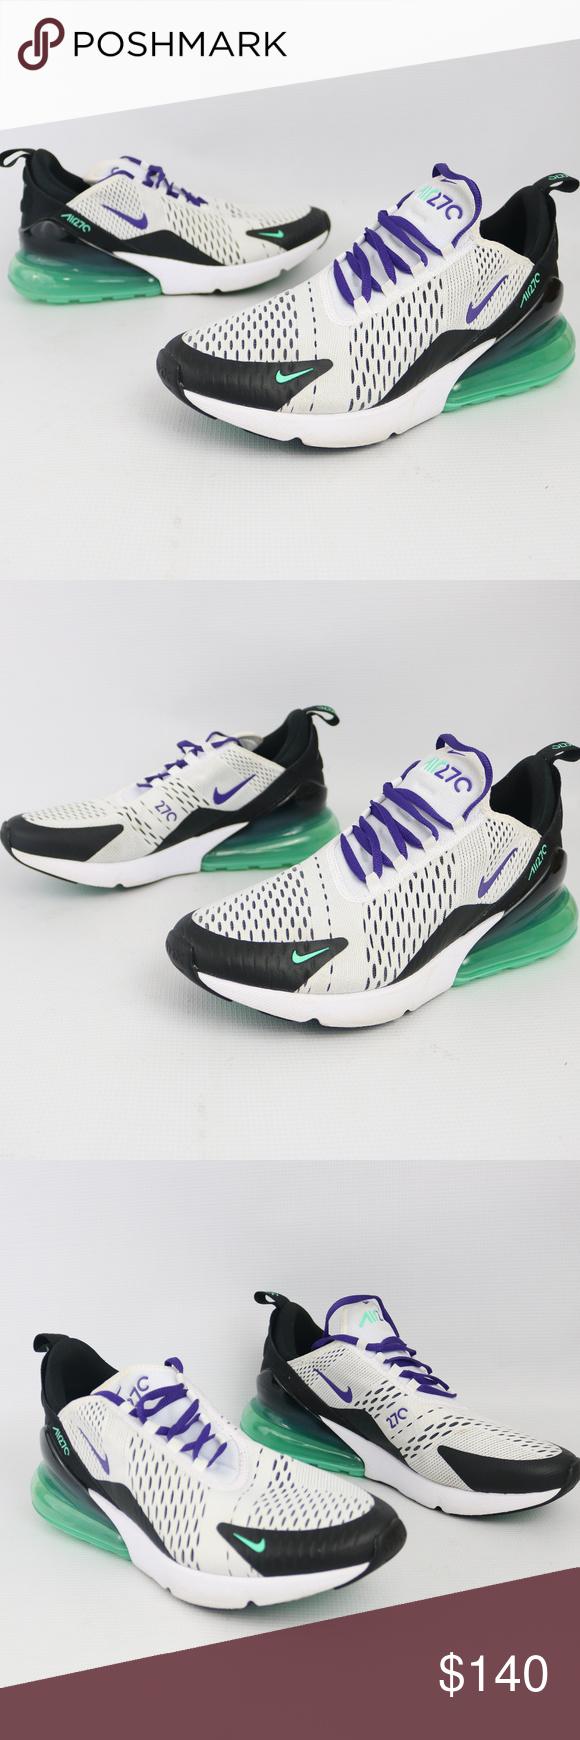 Nike Air Max 270 Grape White Court Purple Black Nike W